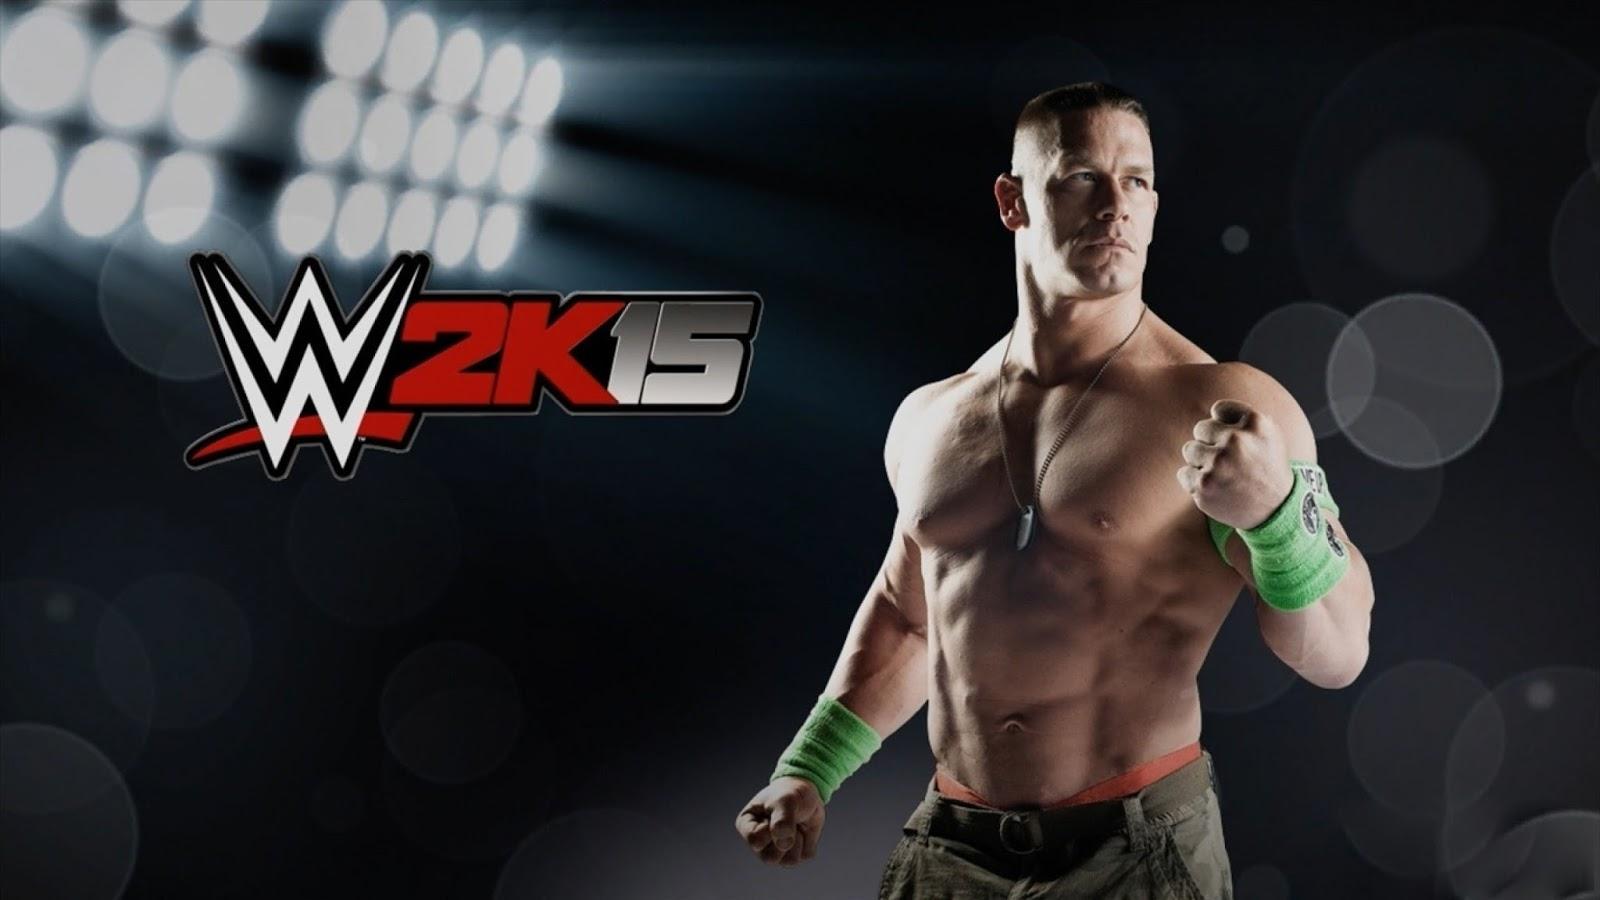 WWE 2K15 John Cena Latest wallpaper HD